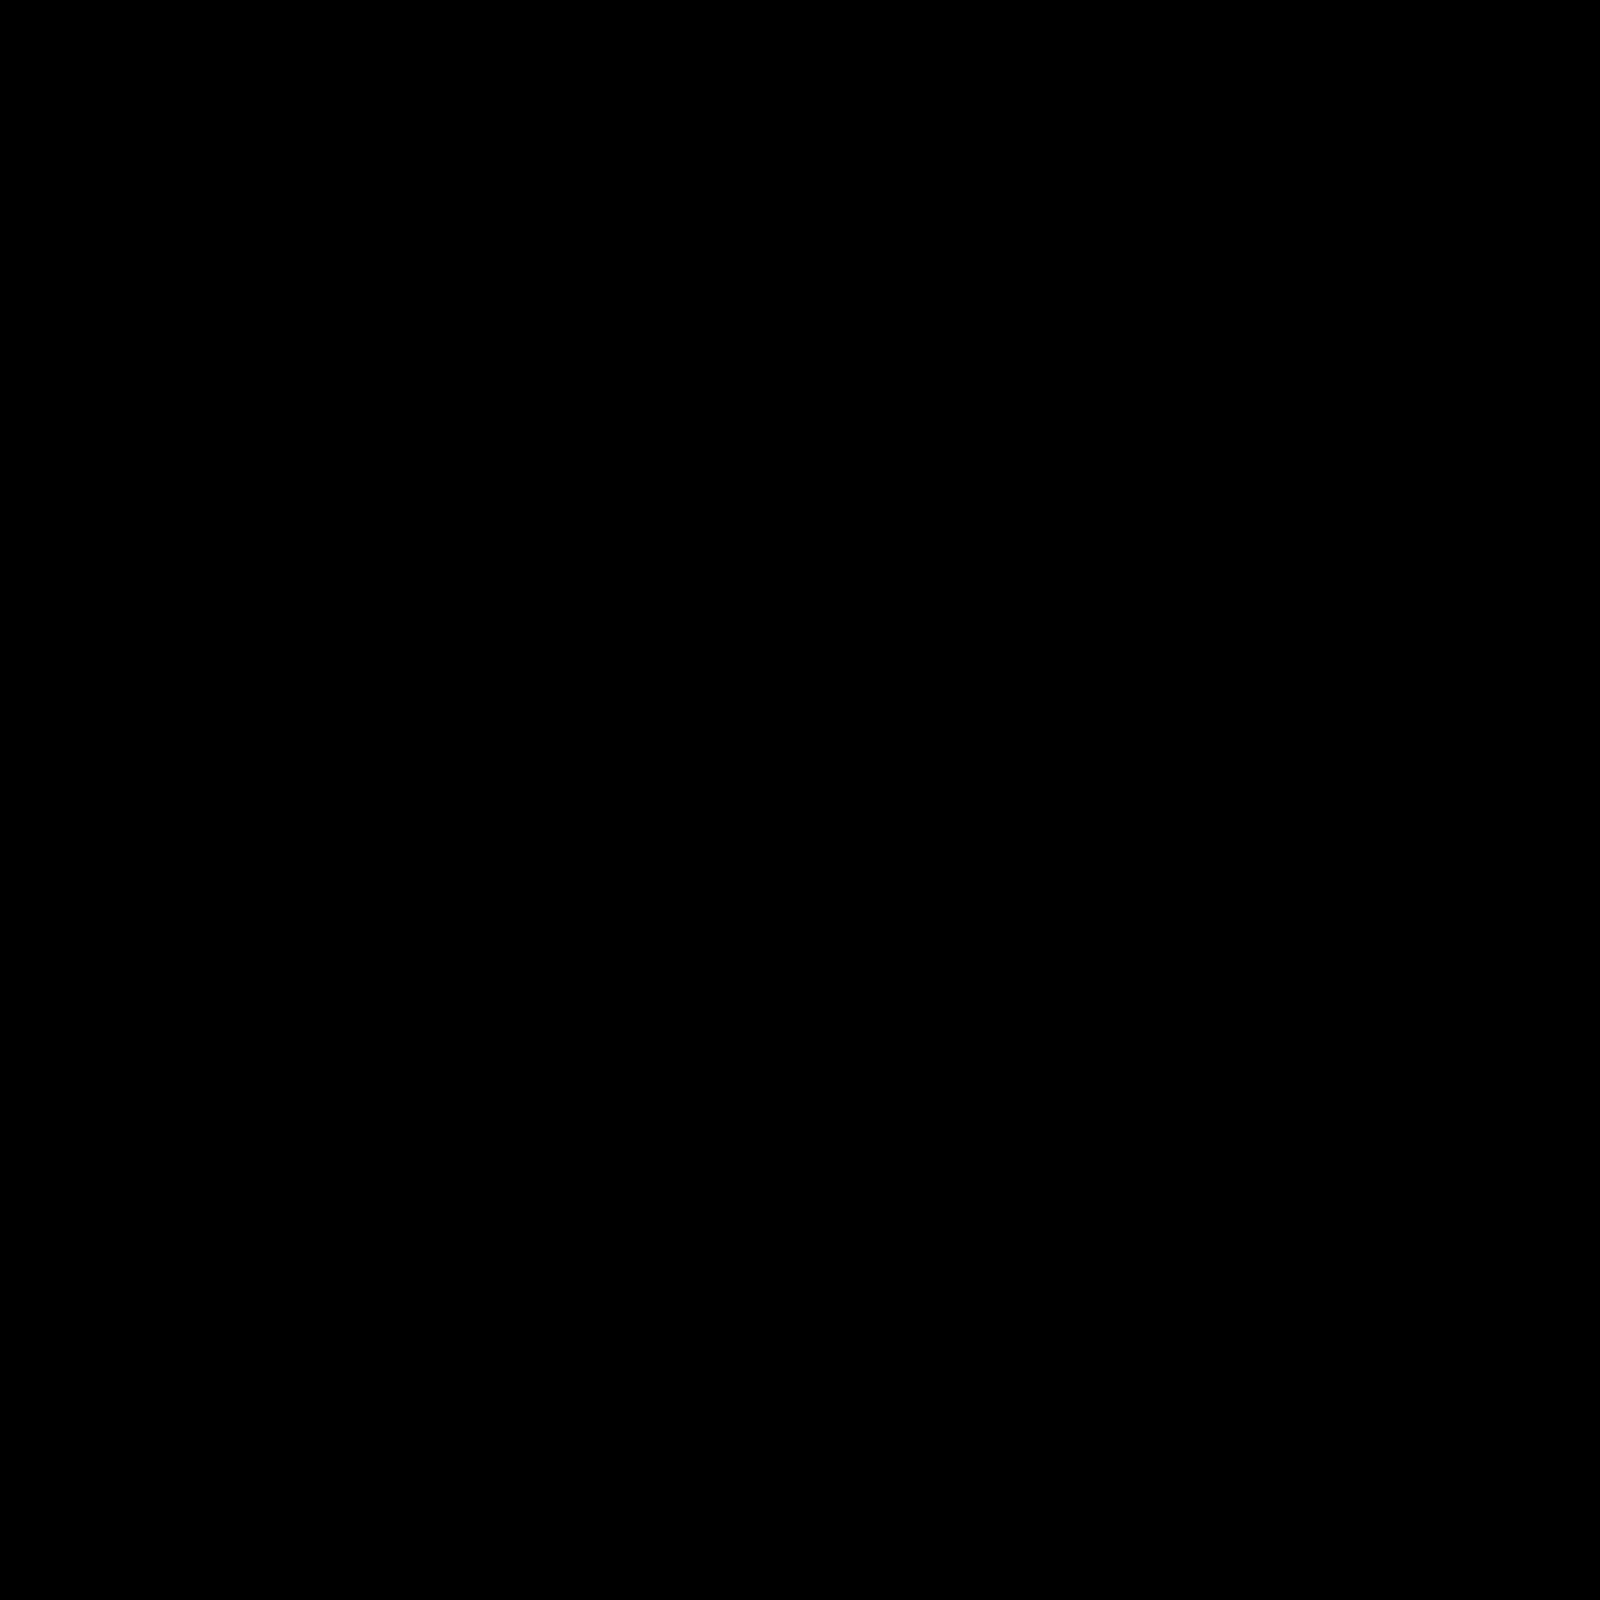 Windows HomeGroup icon